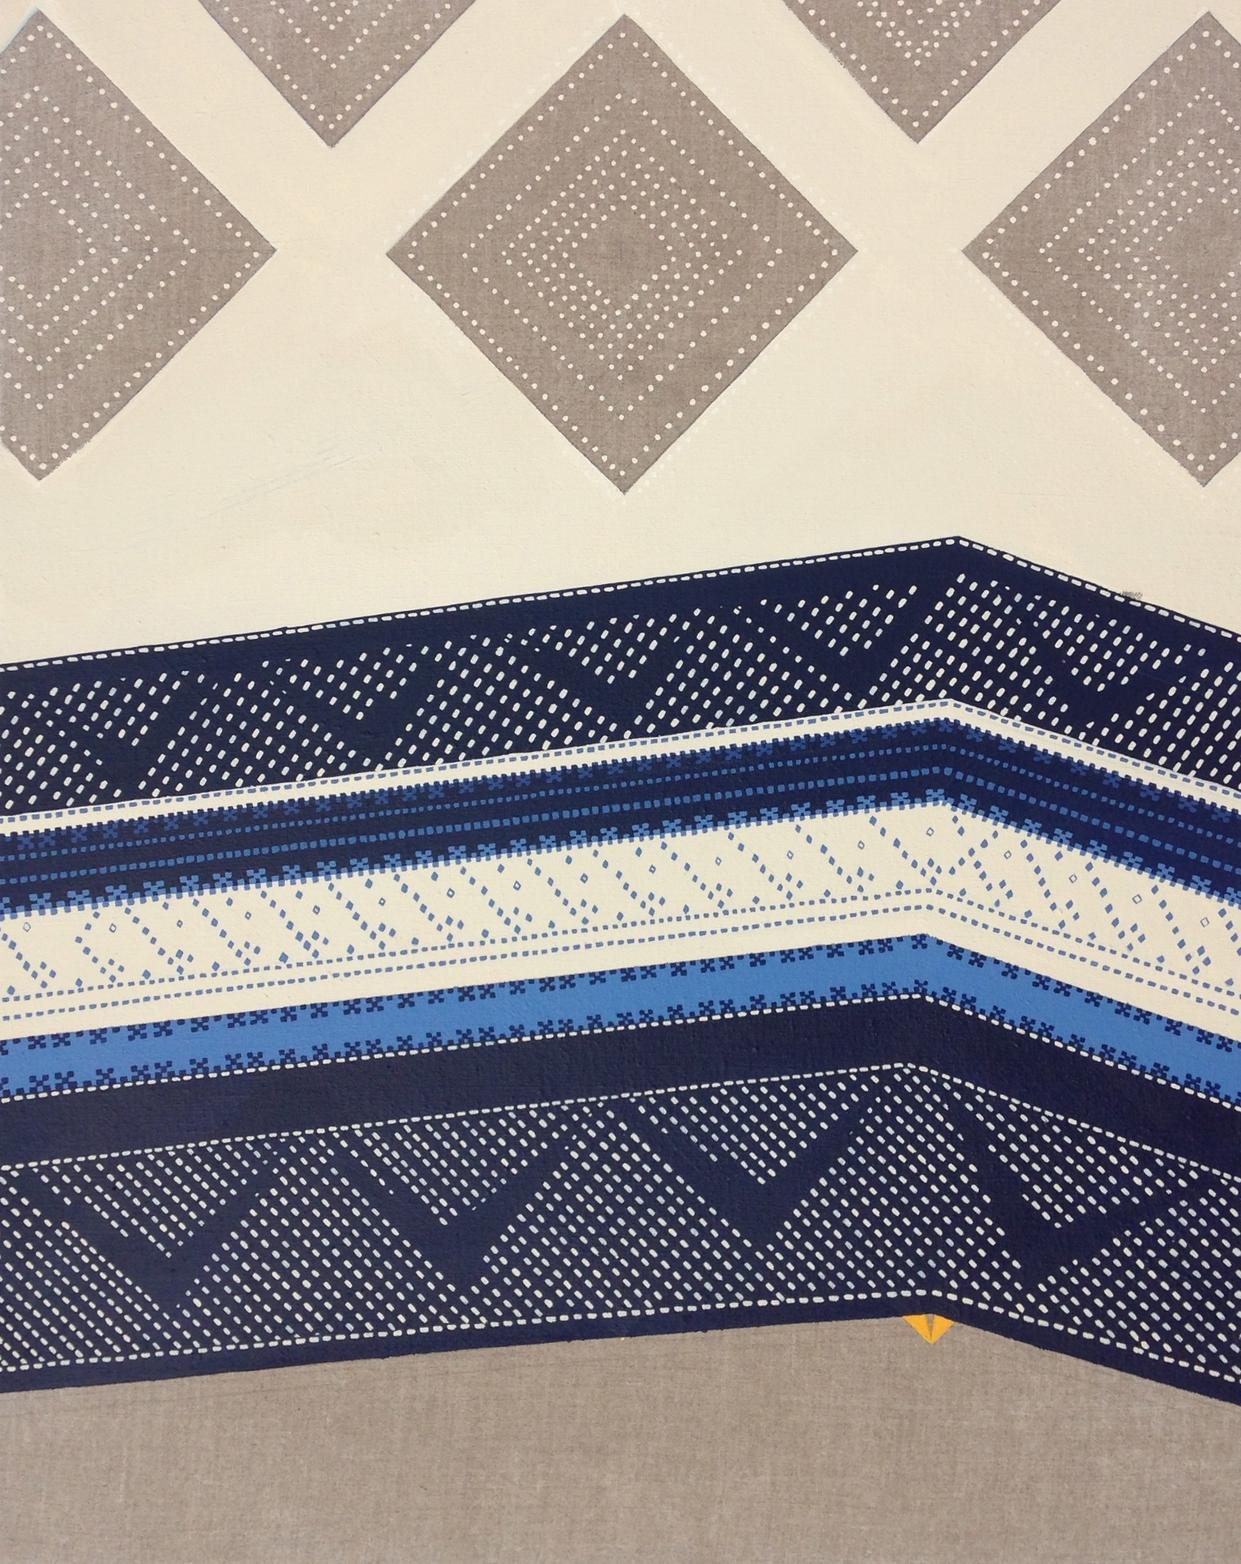 Untitled (blue stitching)